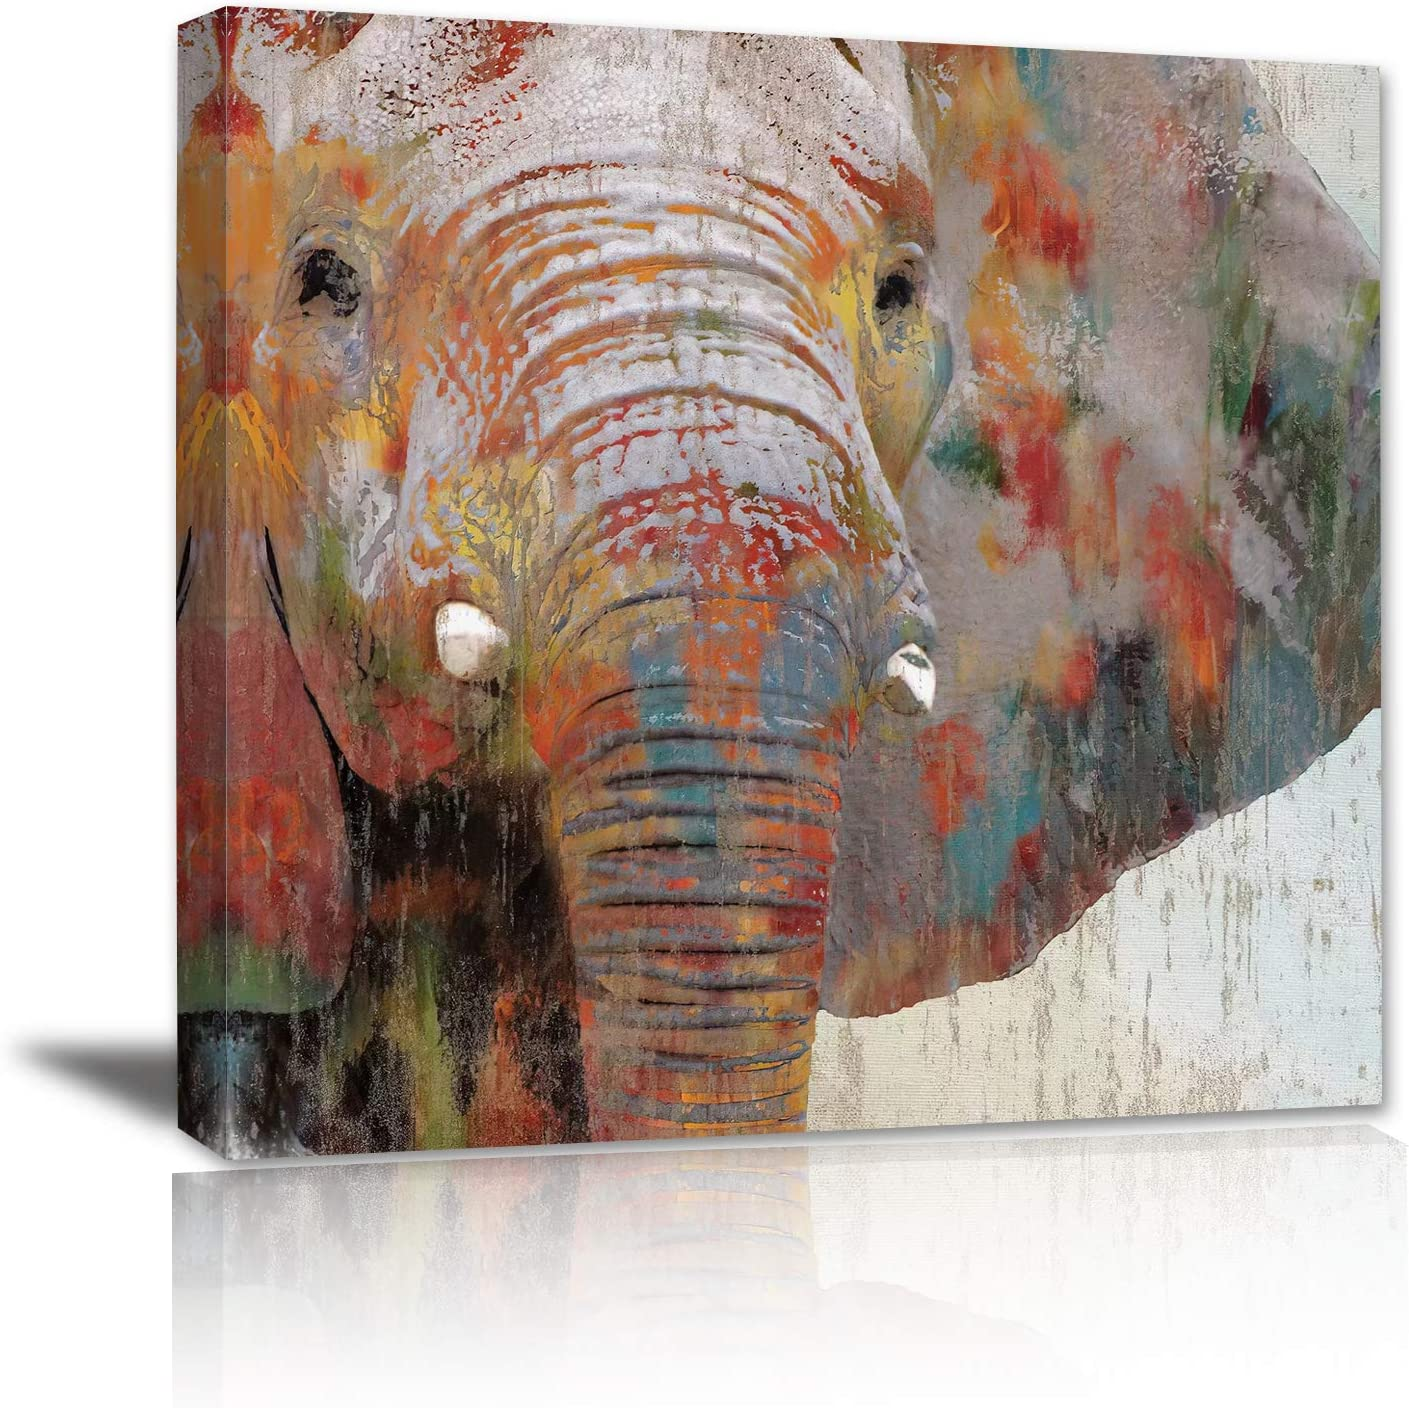 Abstract Grey Elephant Wall Art - Bathroom Kitchen Decor African Safari Animal Head Brass Painting Print Canvas Framed Modern Bedroom Living Room Office Decoration Big Picture Artwork